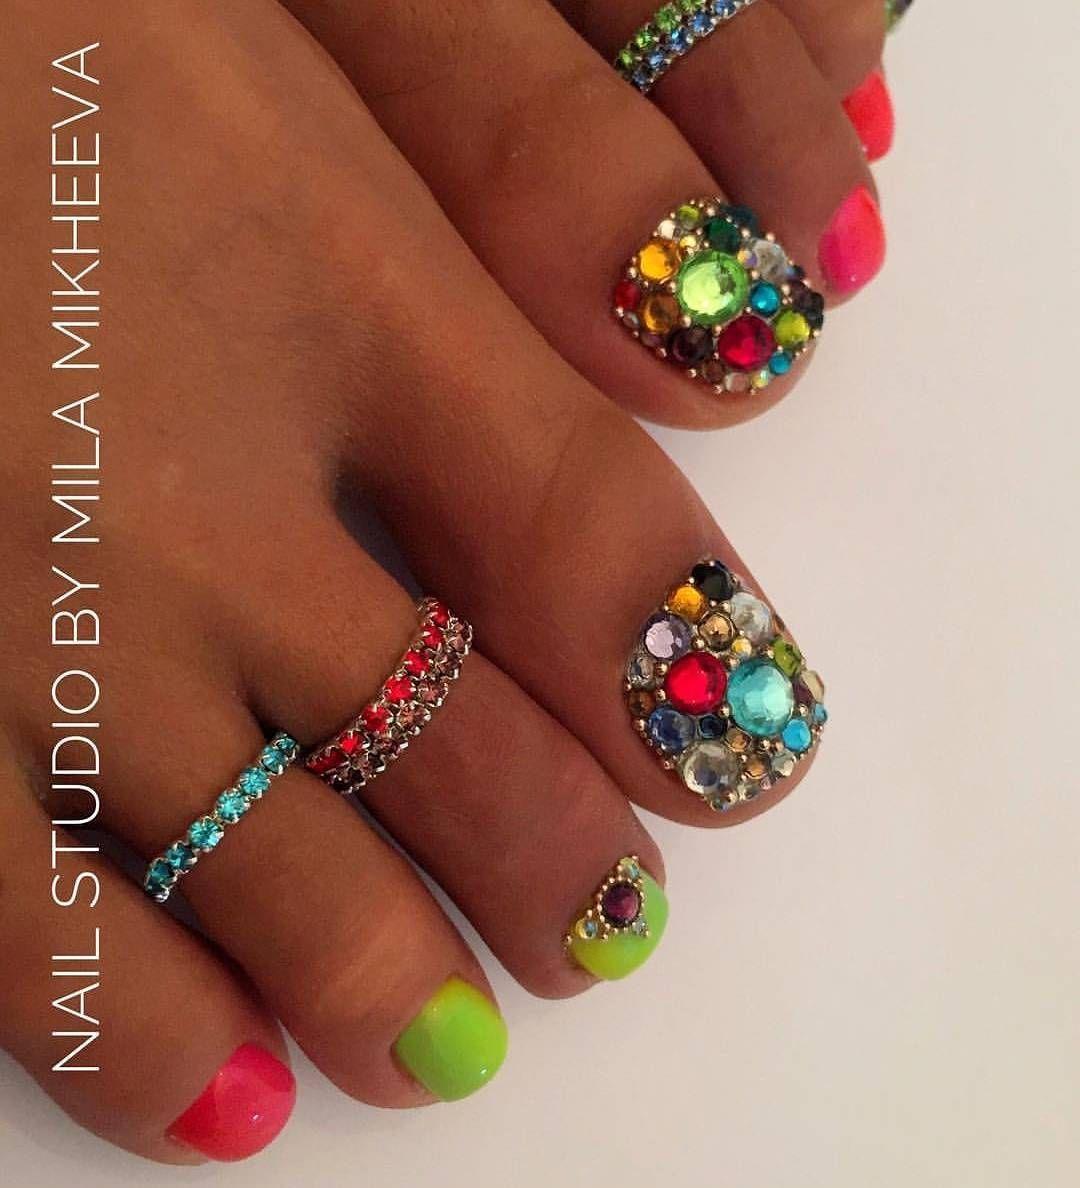 LOVE these colorful stones!   toe nail art   ideas de unas ...